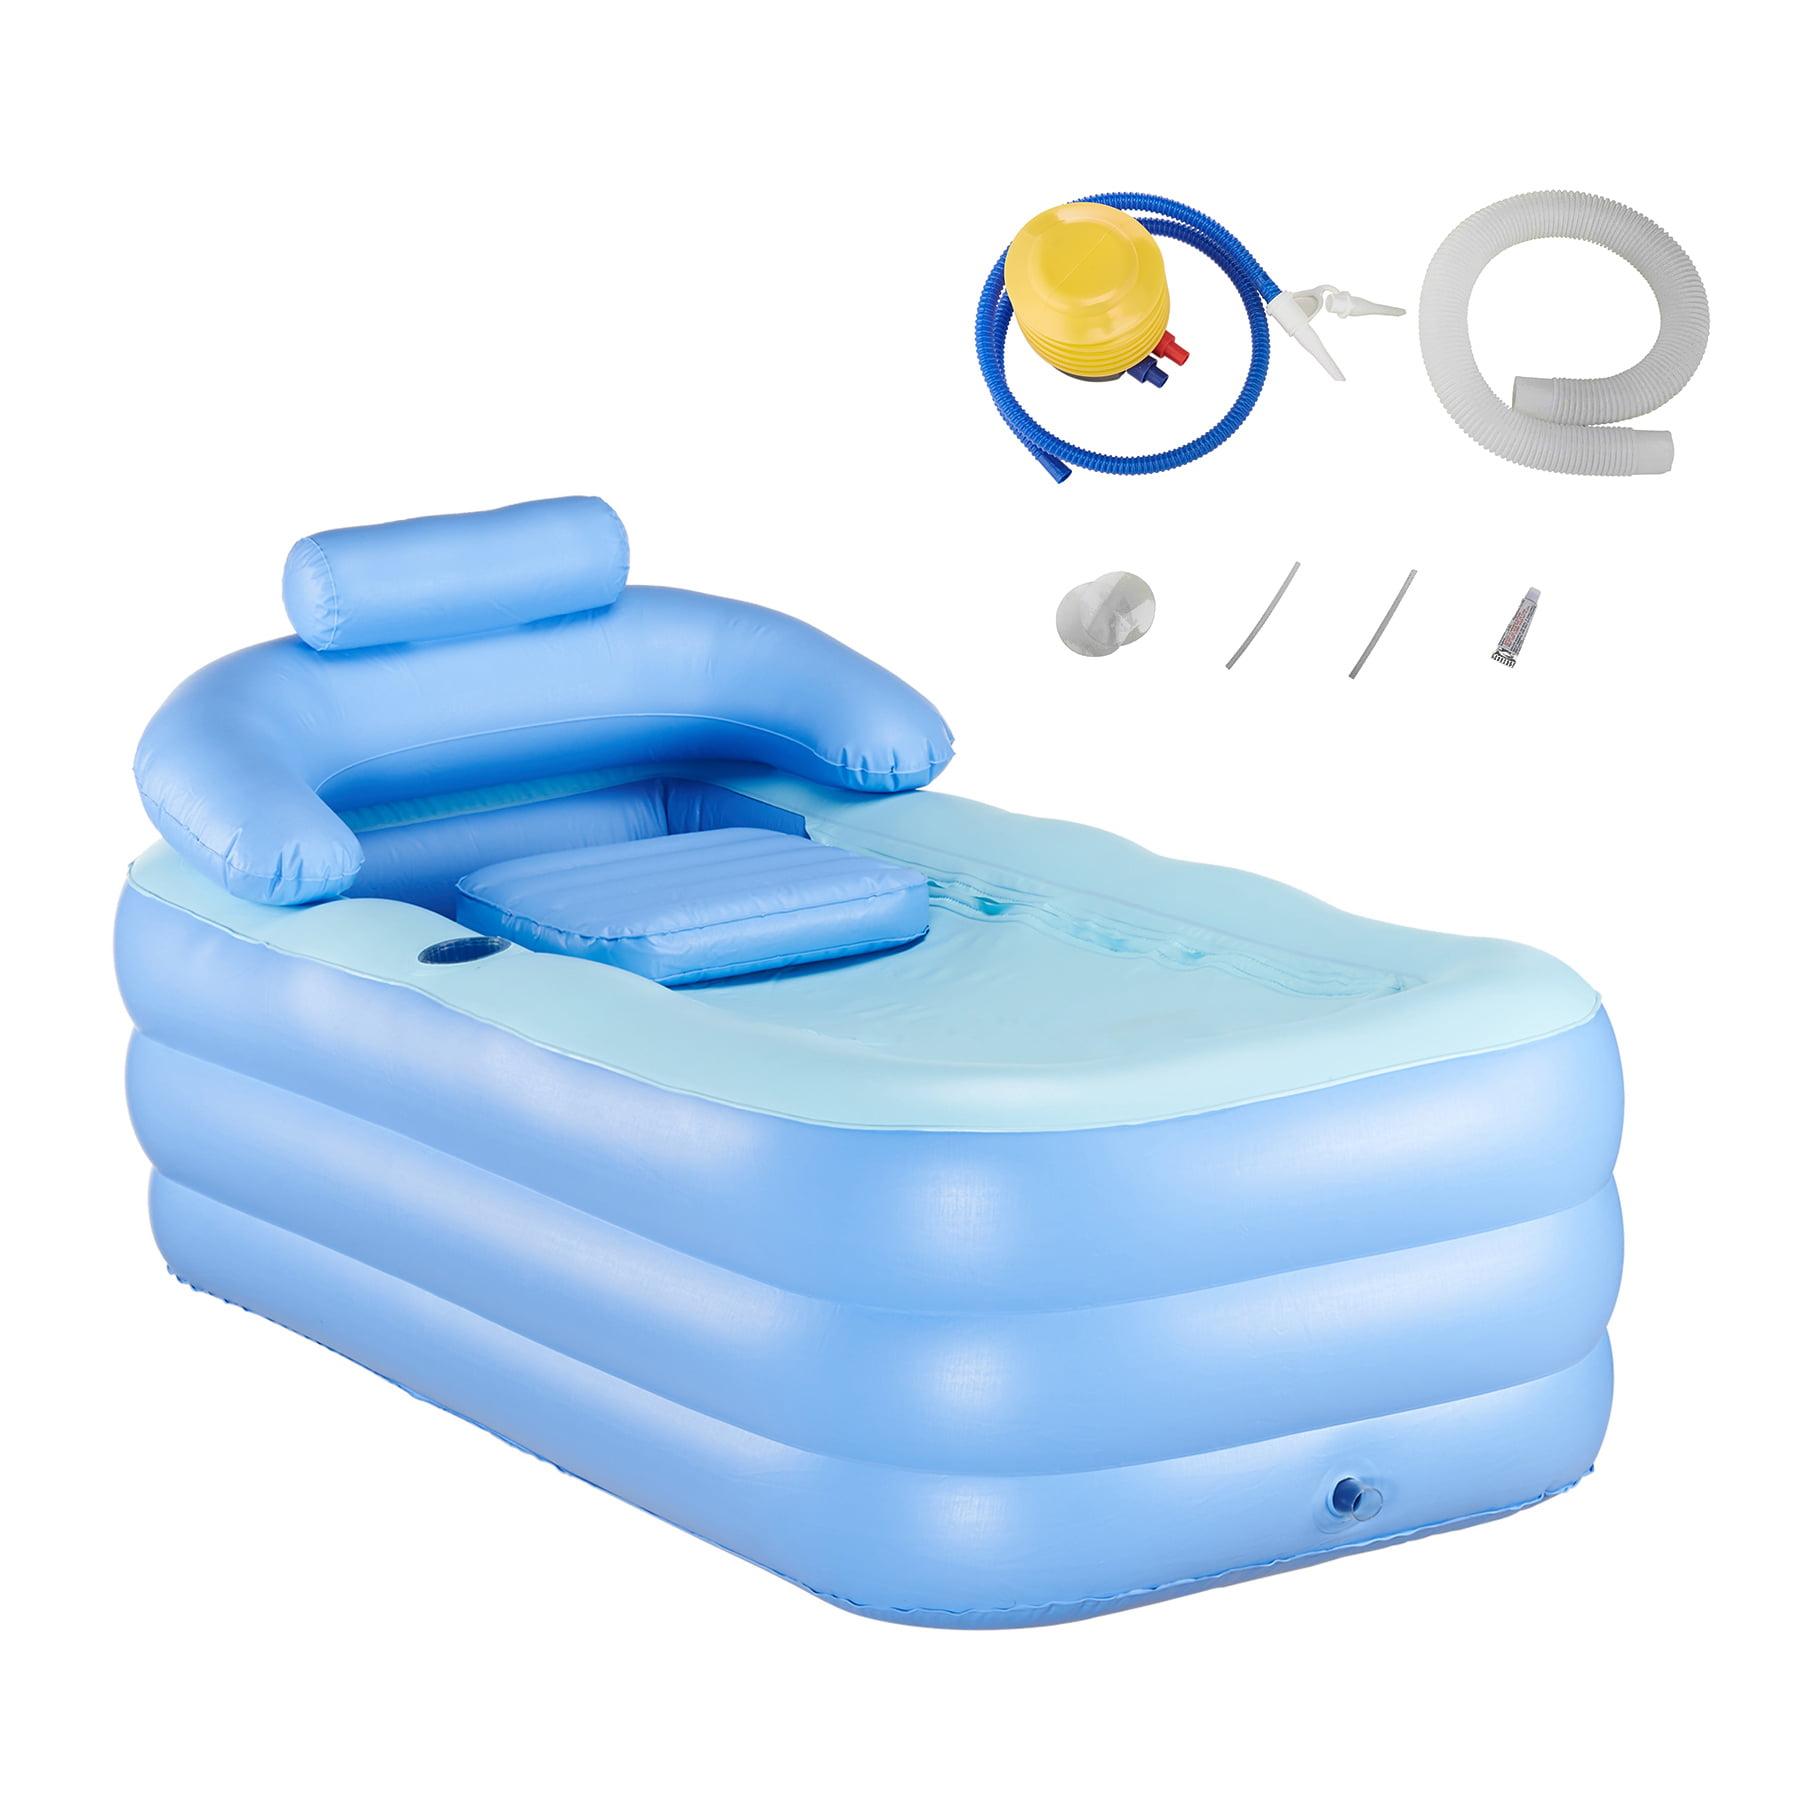 PVC Portable Spa Warm Bathtub Blow Up Adult Inflatable Bath Tub Air ...